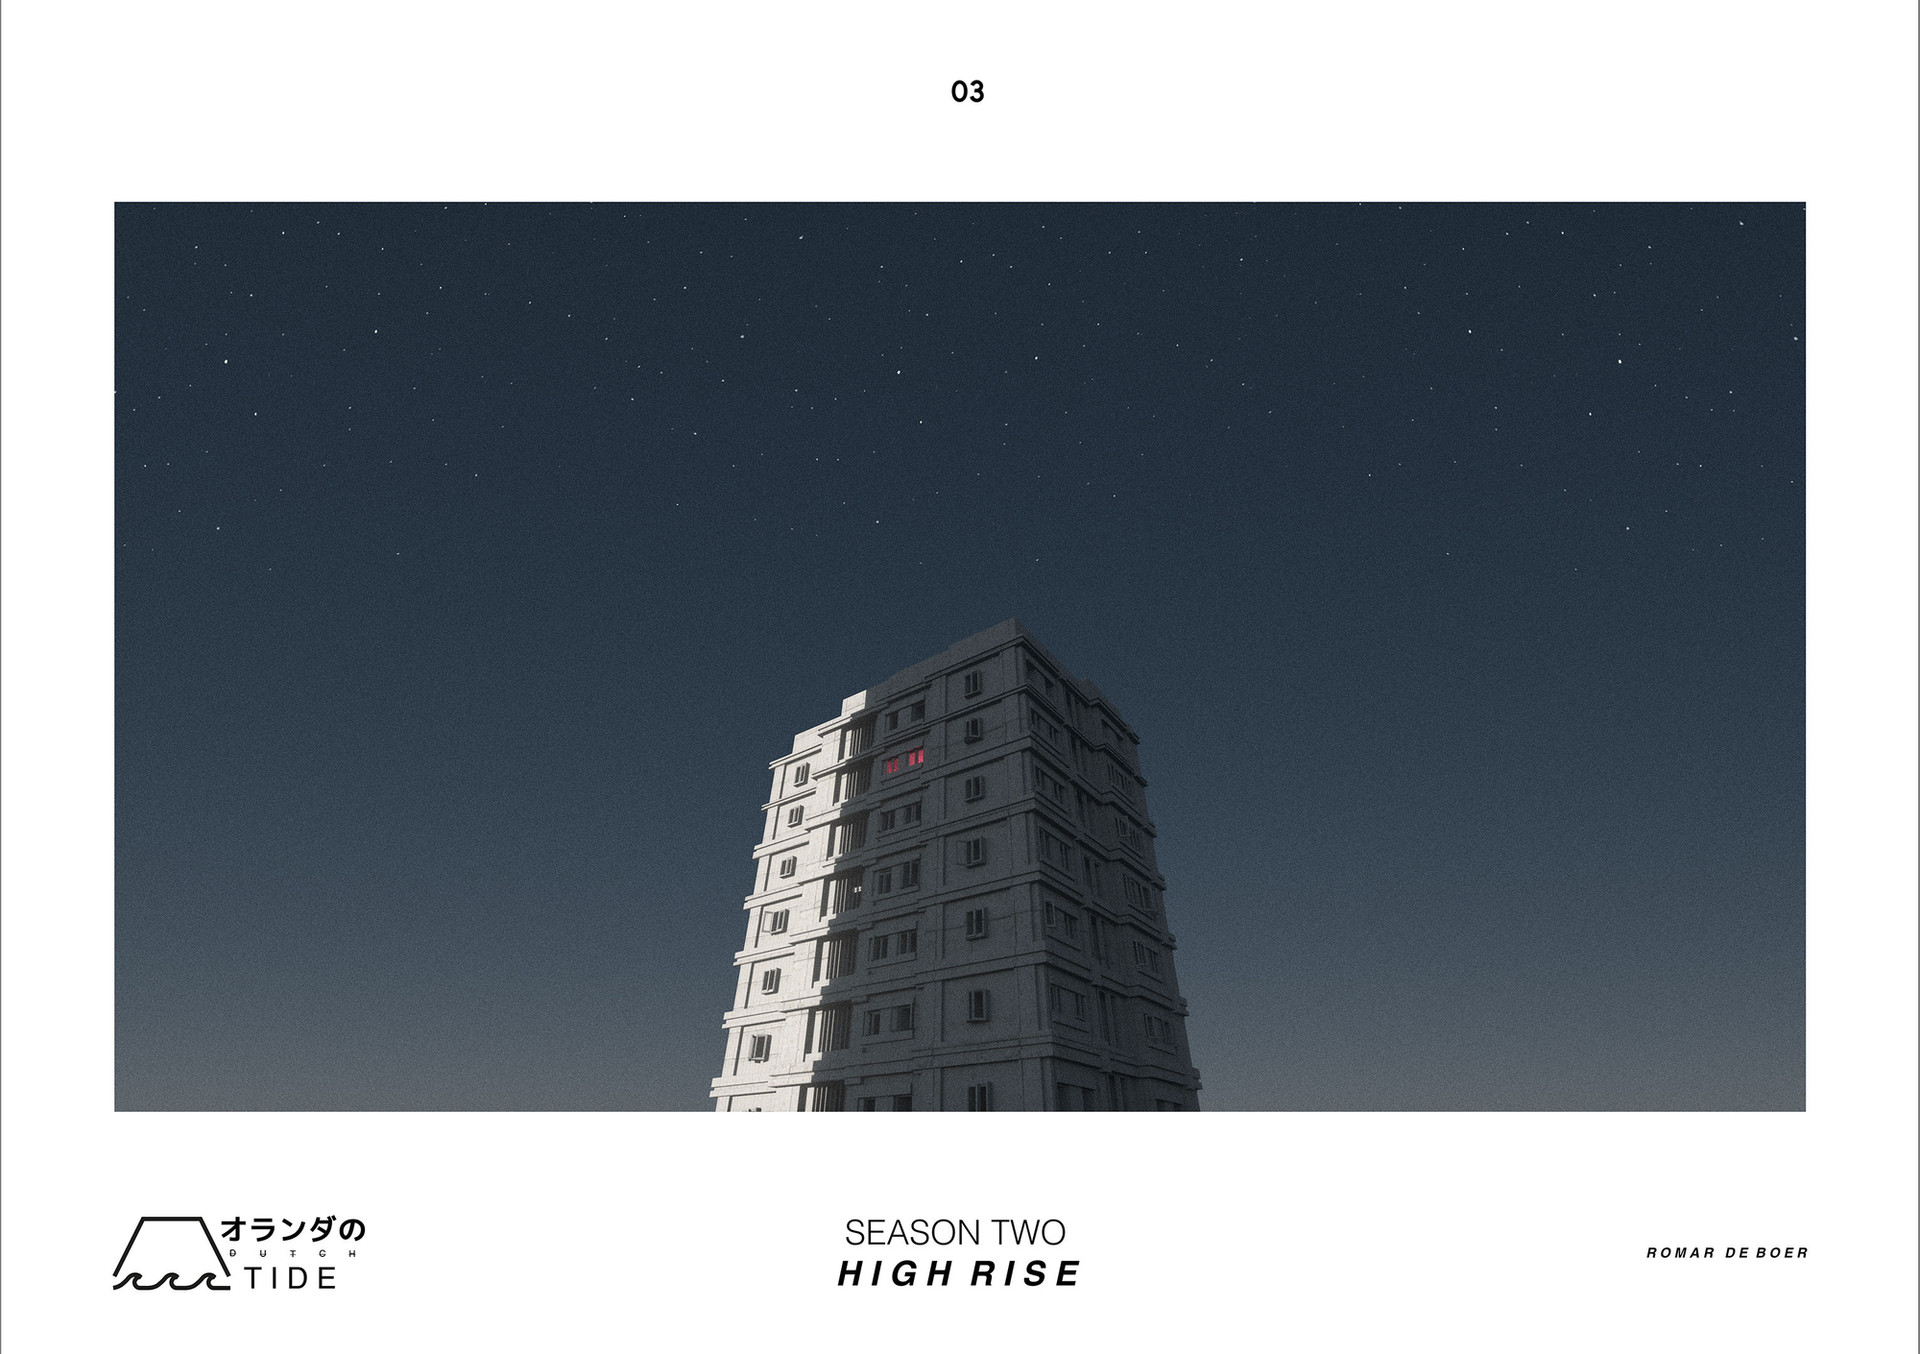 highrise_03_a2_web.jpg